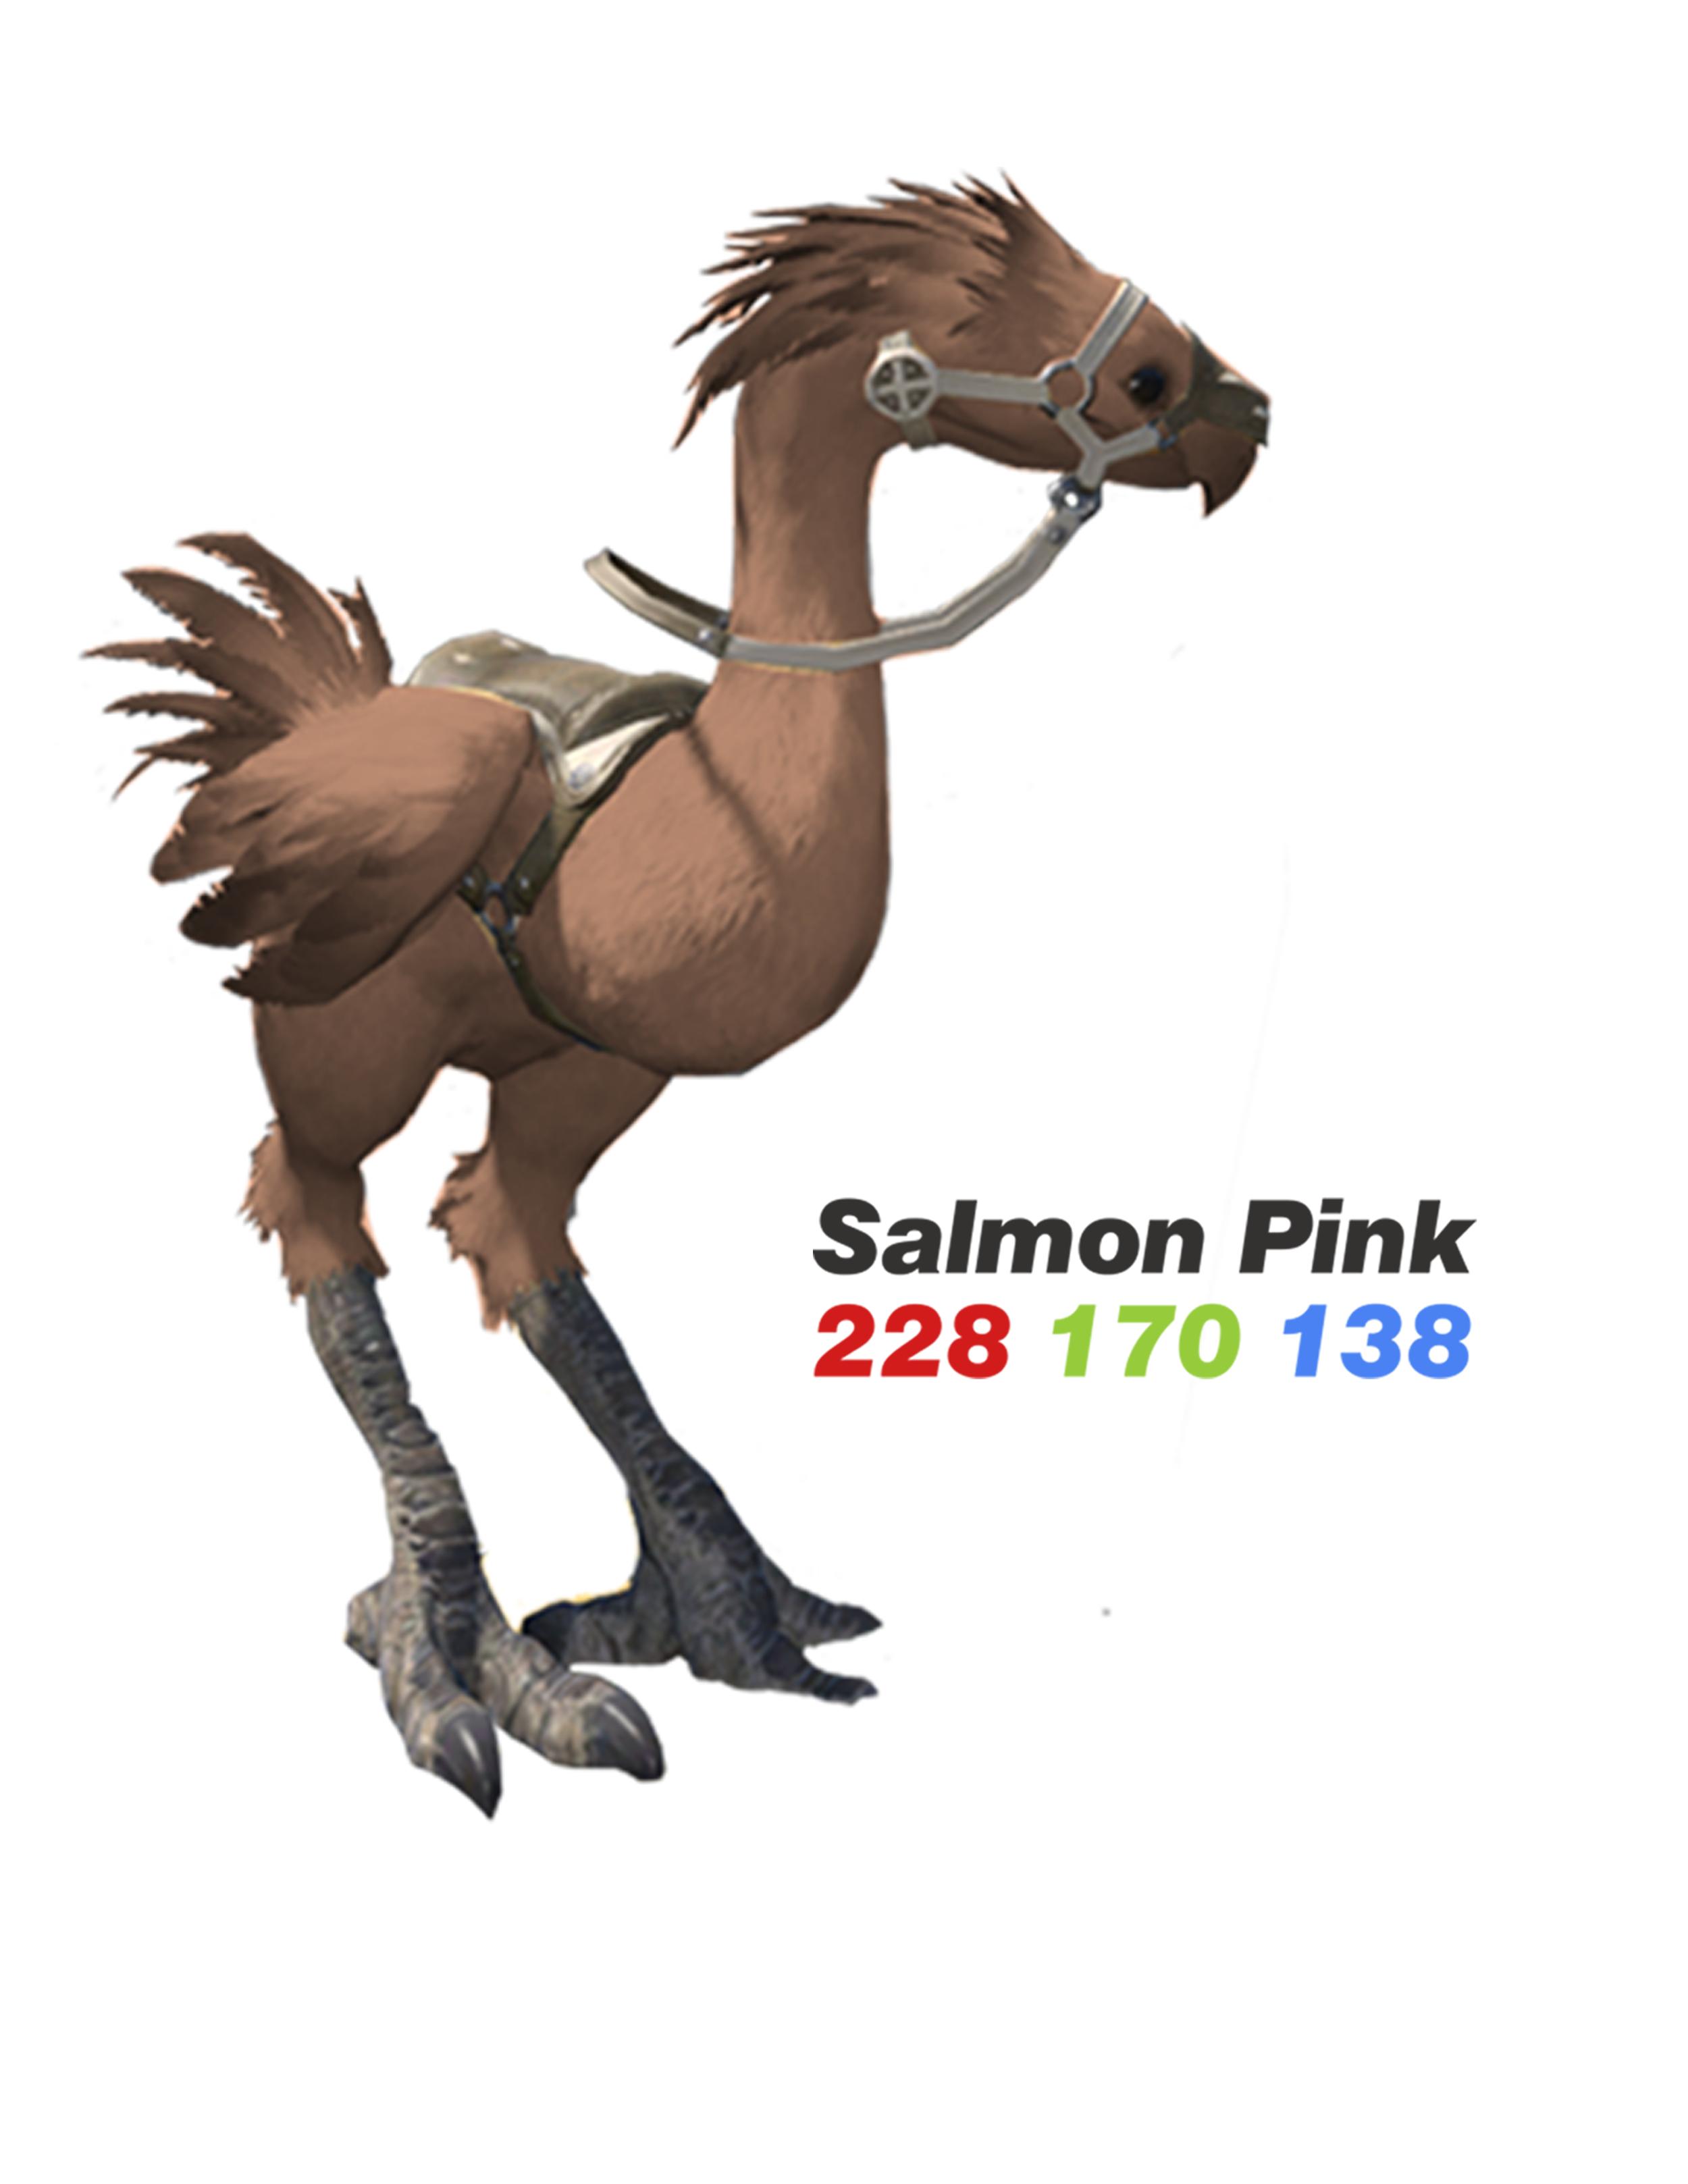 SalmonPink.png